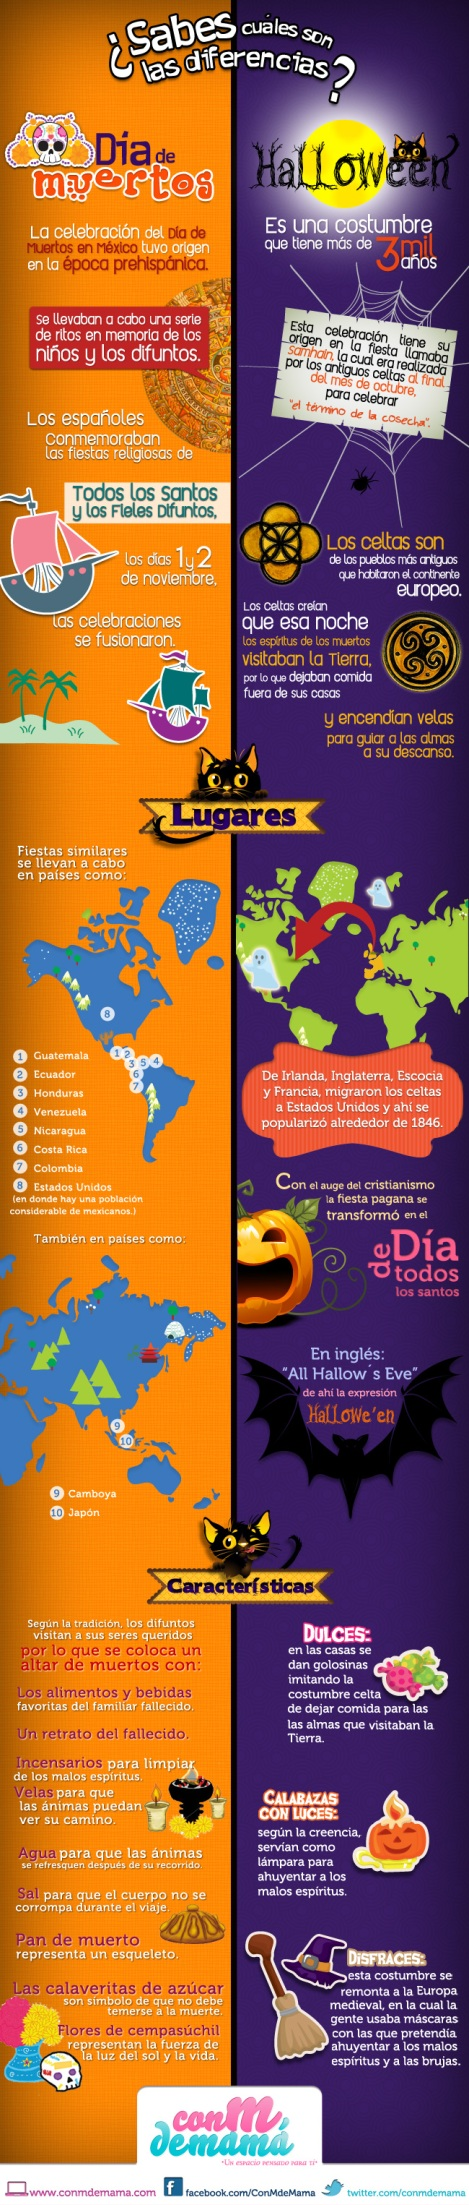 Infografía-Dia-de-Muertos